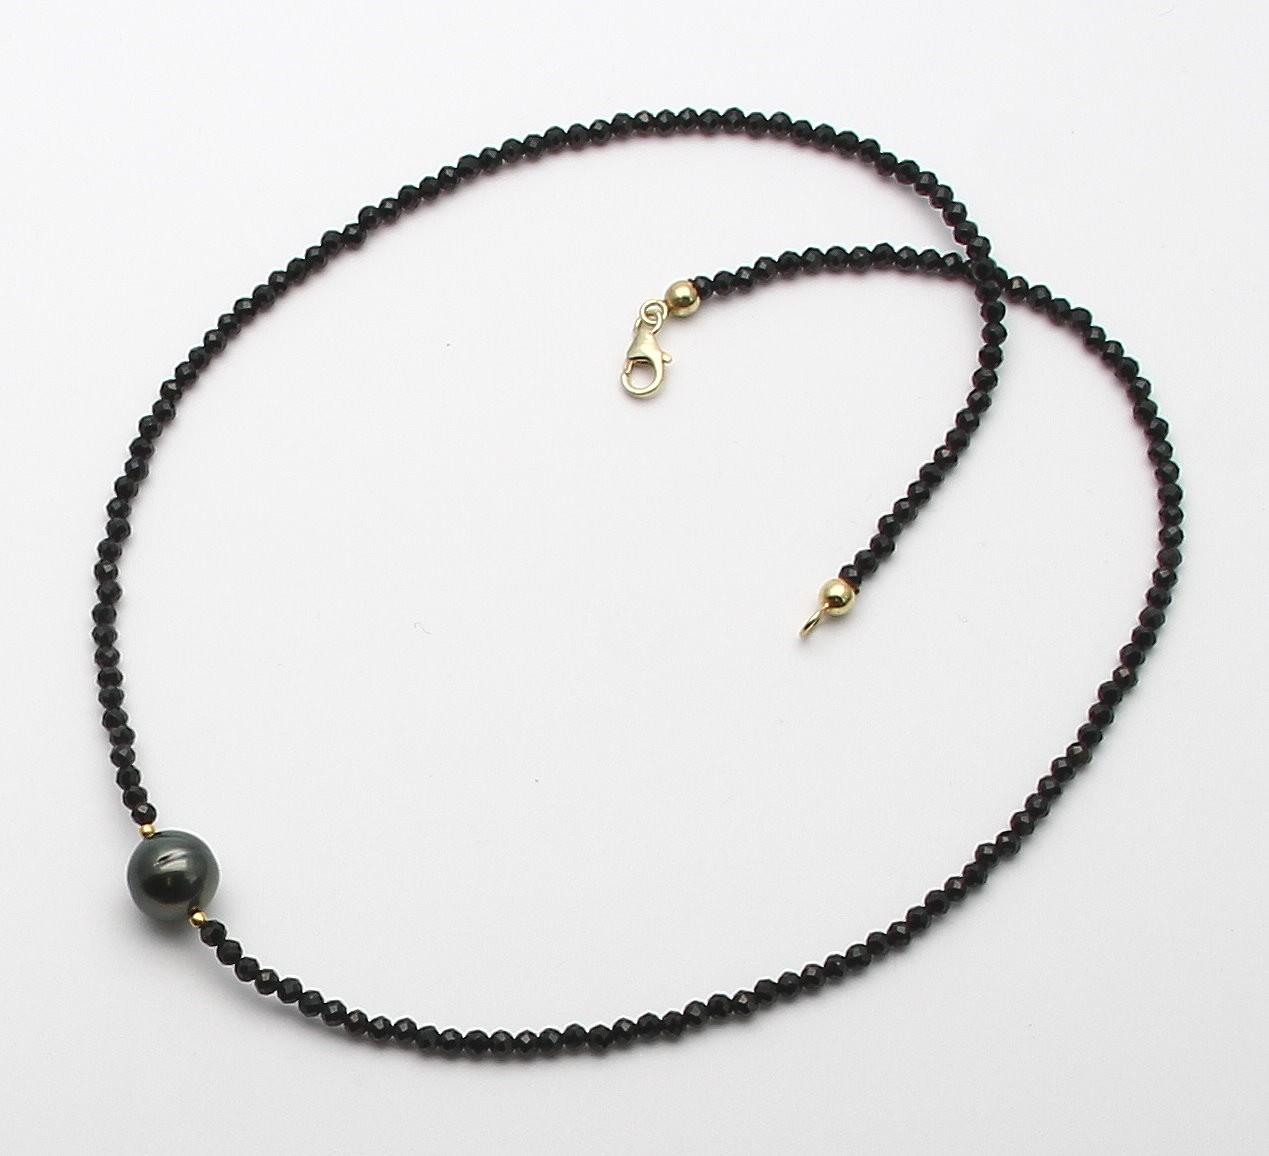 spinellkette schwarzer spinell mit tahiti perle 46 cm in edelstei. Black Bedroom Furniture Sets. Home Design Ideas